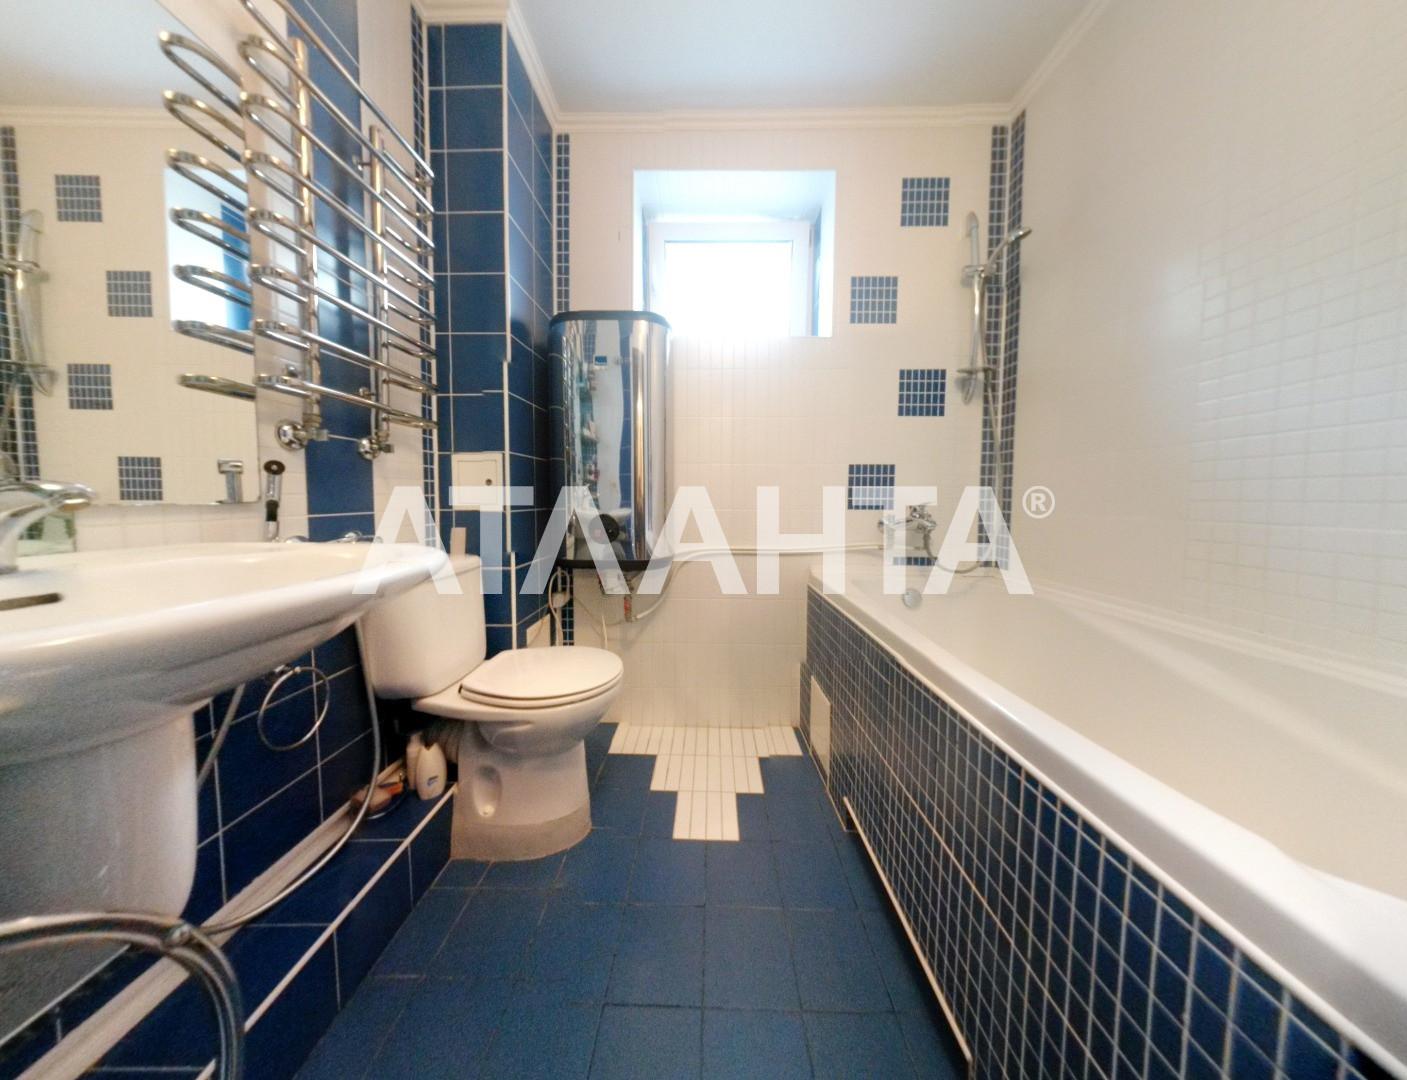 Продается 3-комнатная Квартира на ул. Ул. Ломоносова — 139 600 у.е. (фото №12)